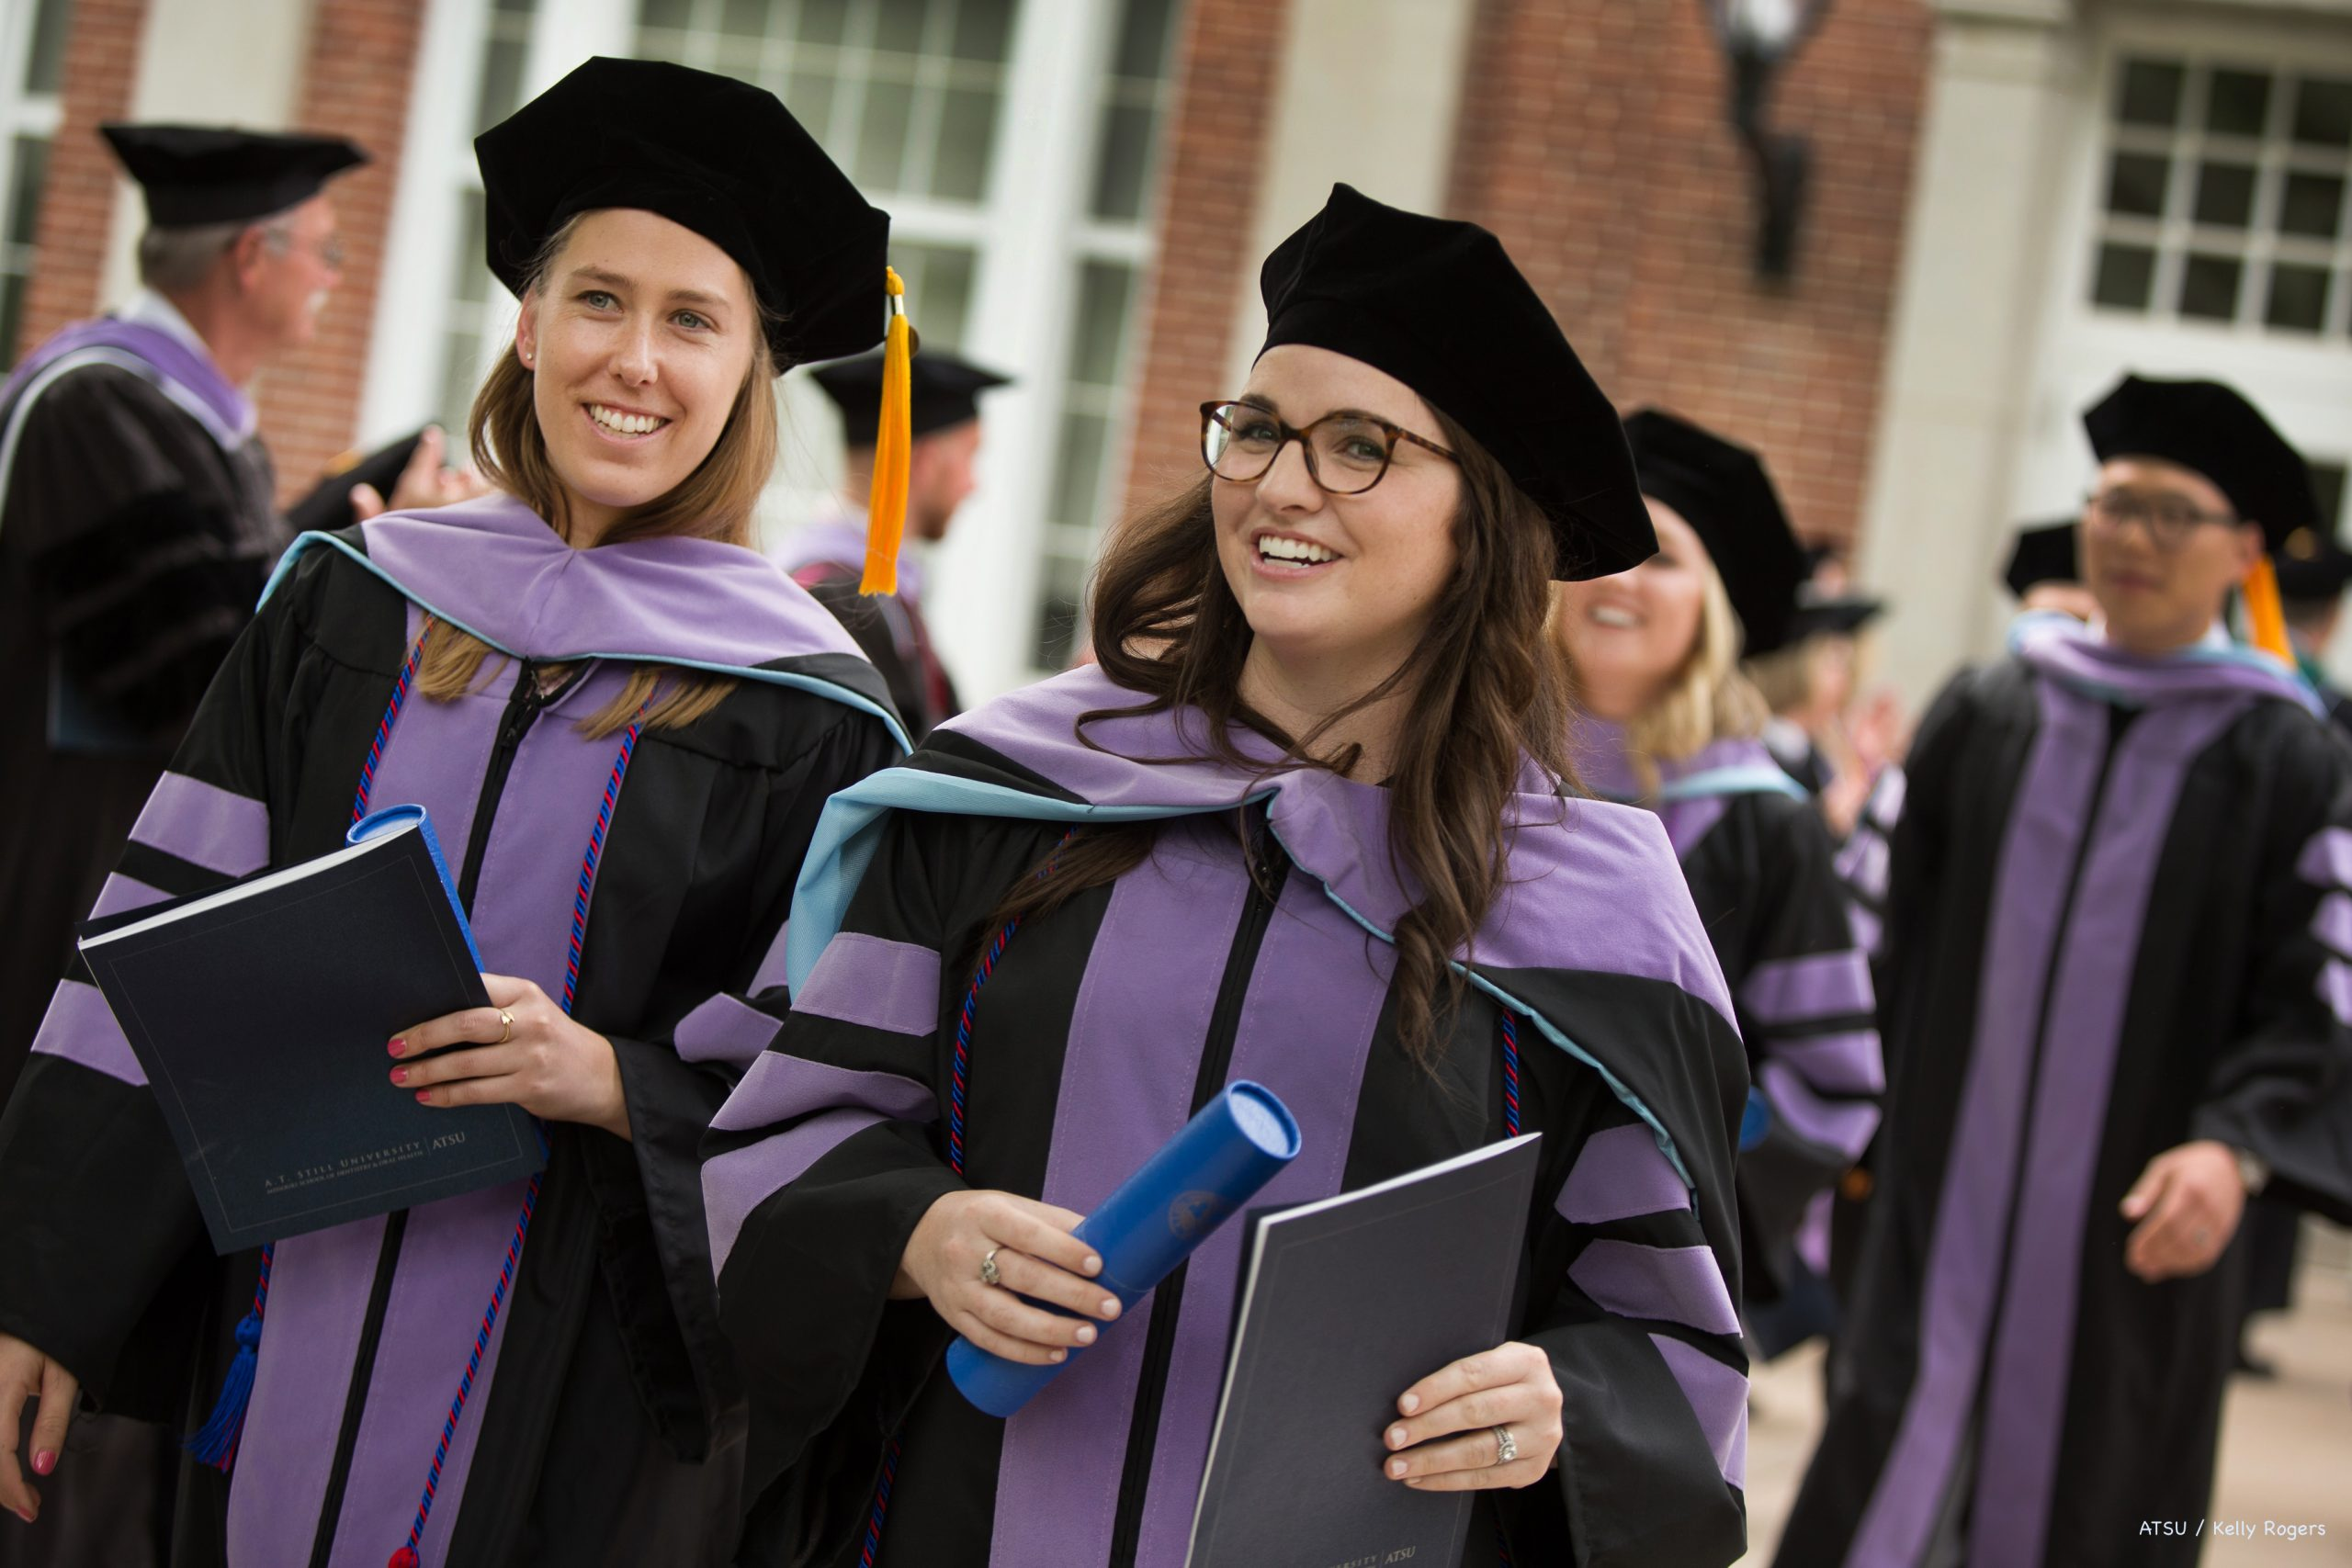 Graduates walk out of Baldwin Hall Auditorium holding their diploma.